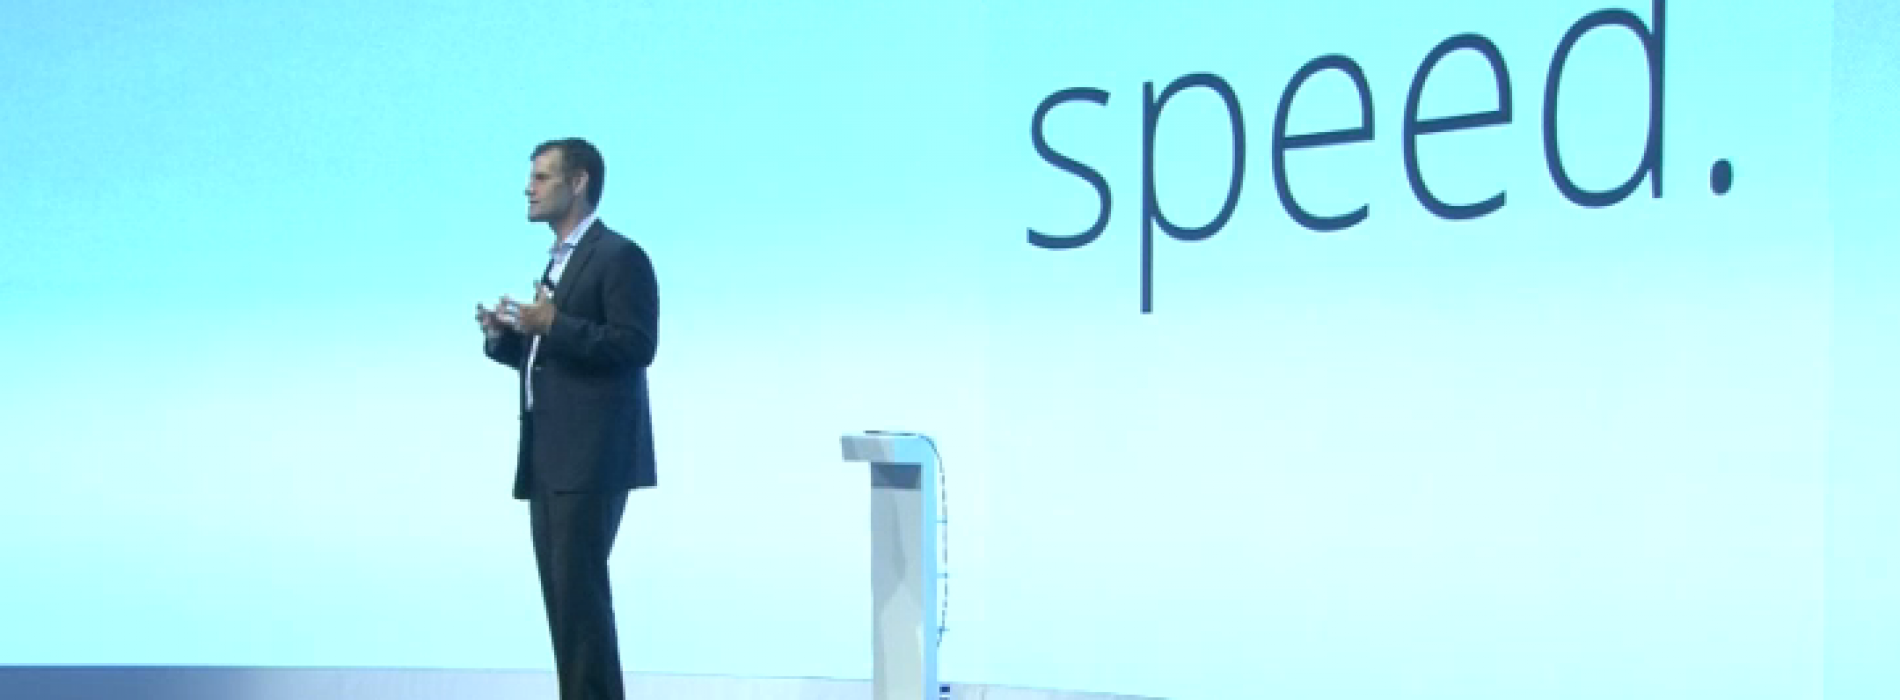 Motorola: 'The new Motorola starts today'